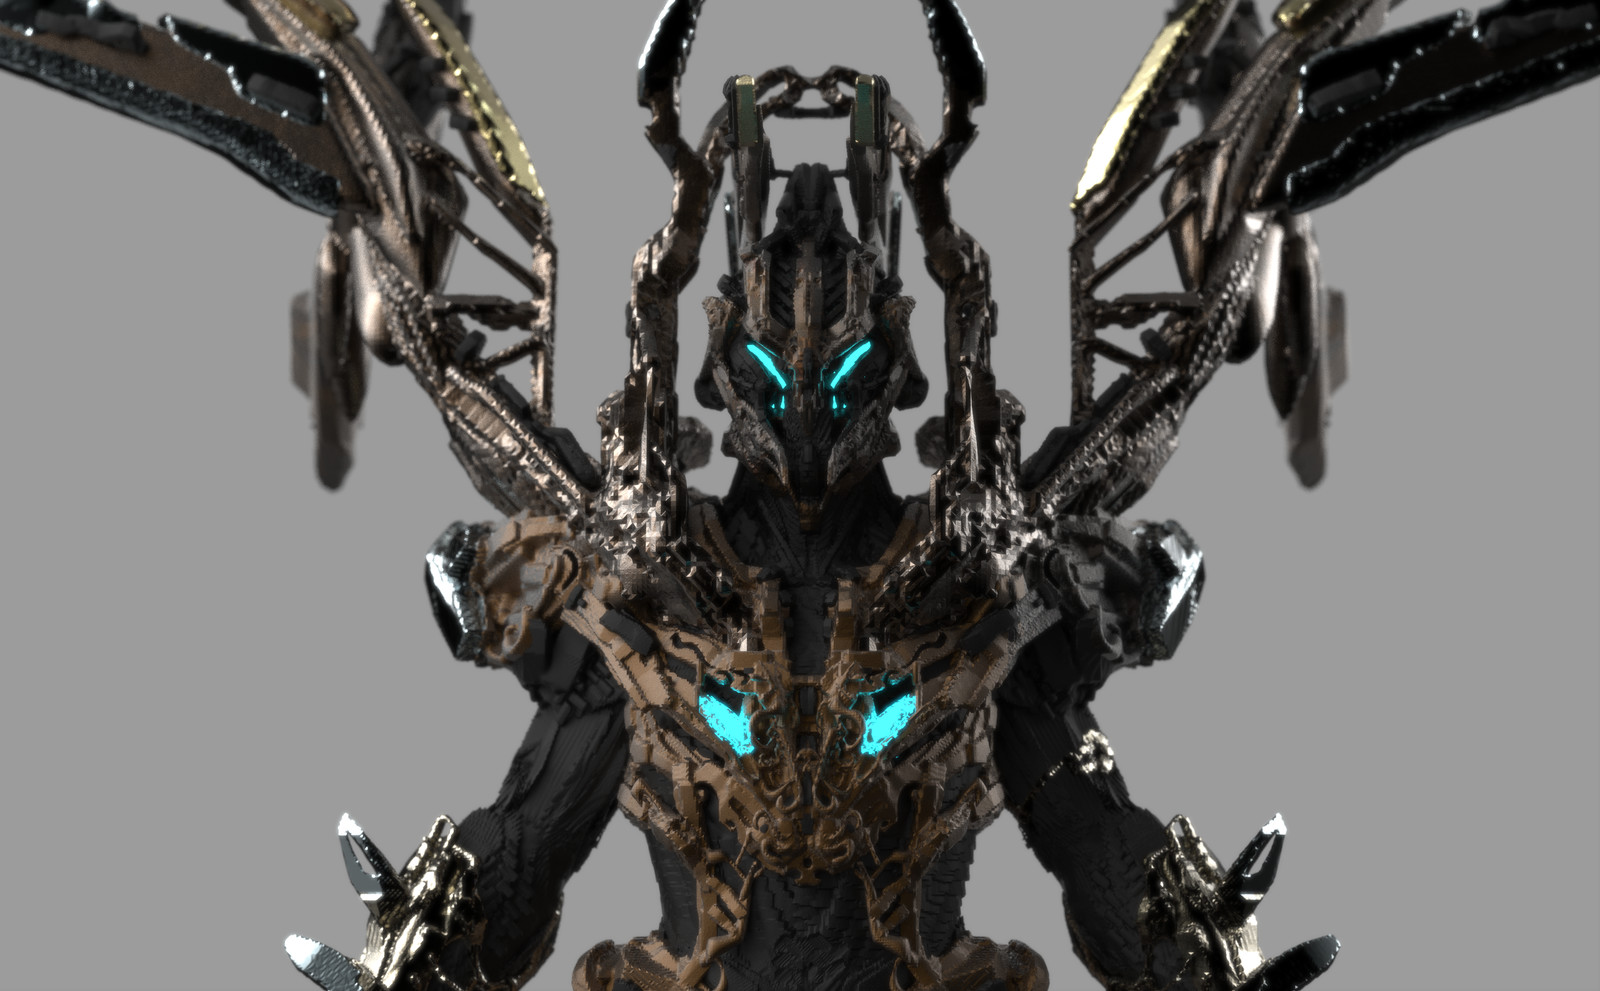 Mech Greek Warrior 3D Coat concept